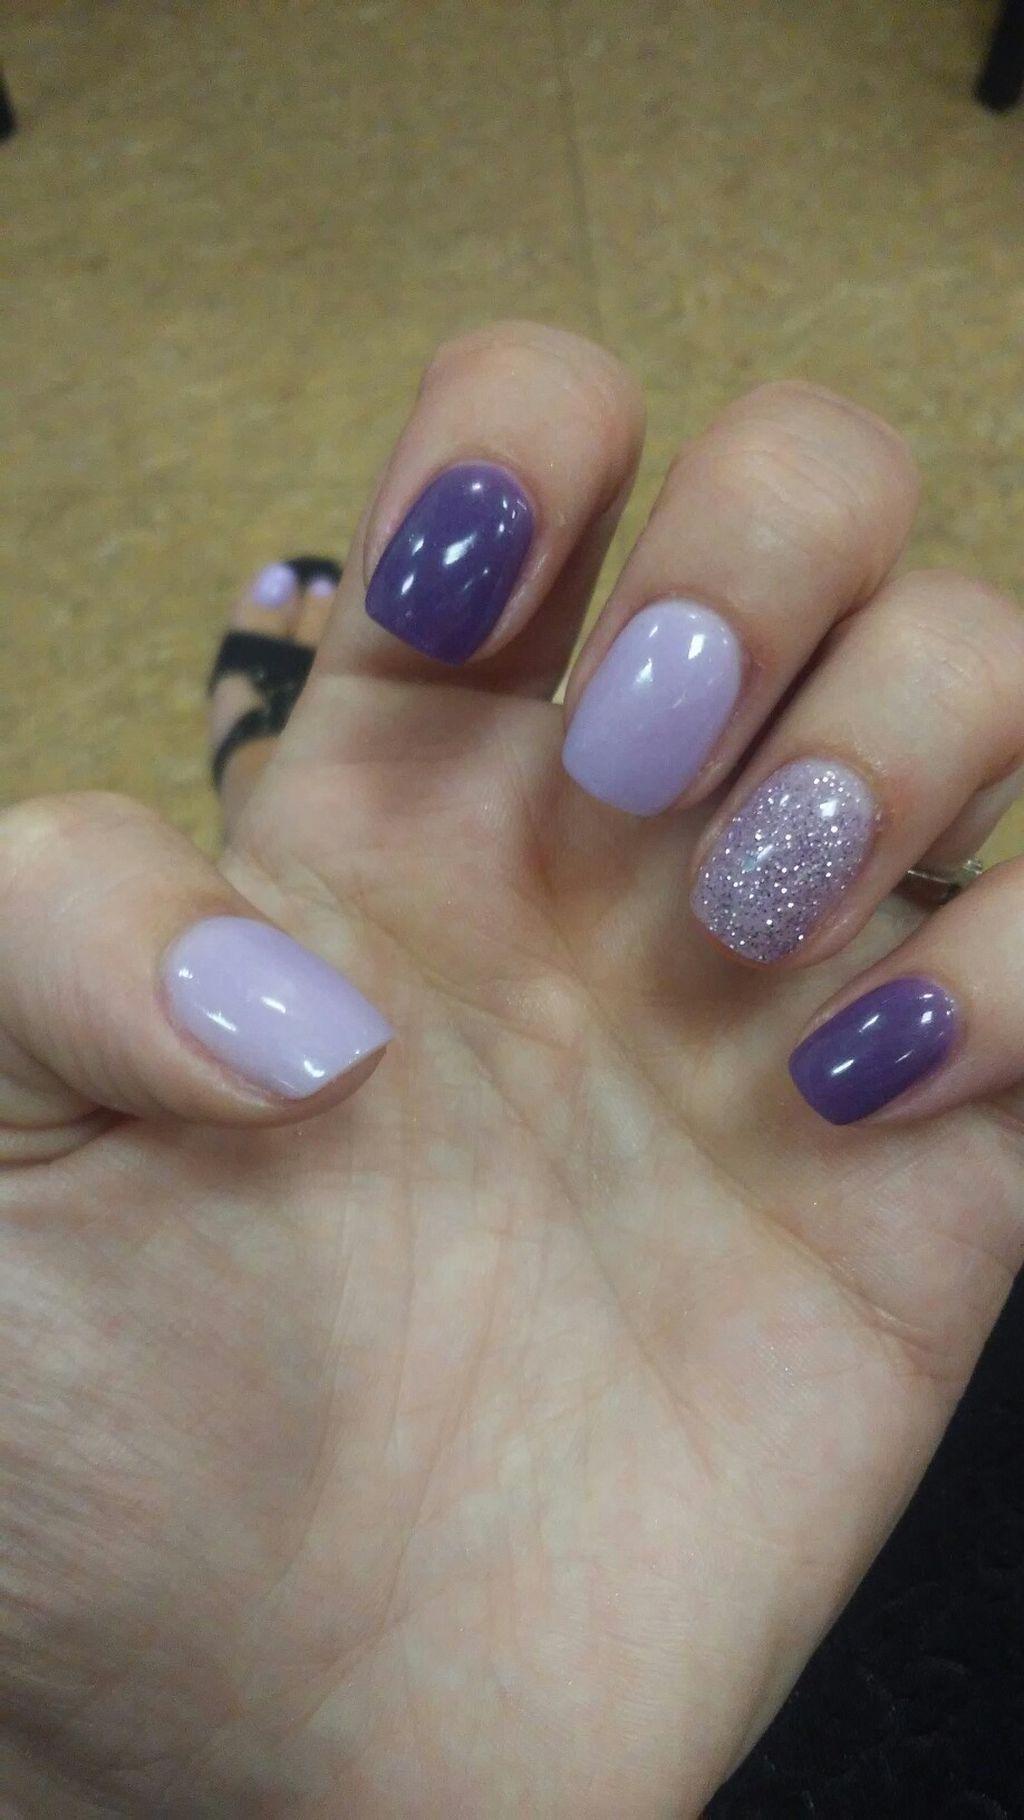 99 Minimal But Beautiful Nails Art Inspiration Ideas For Women Who